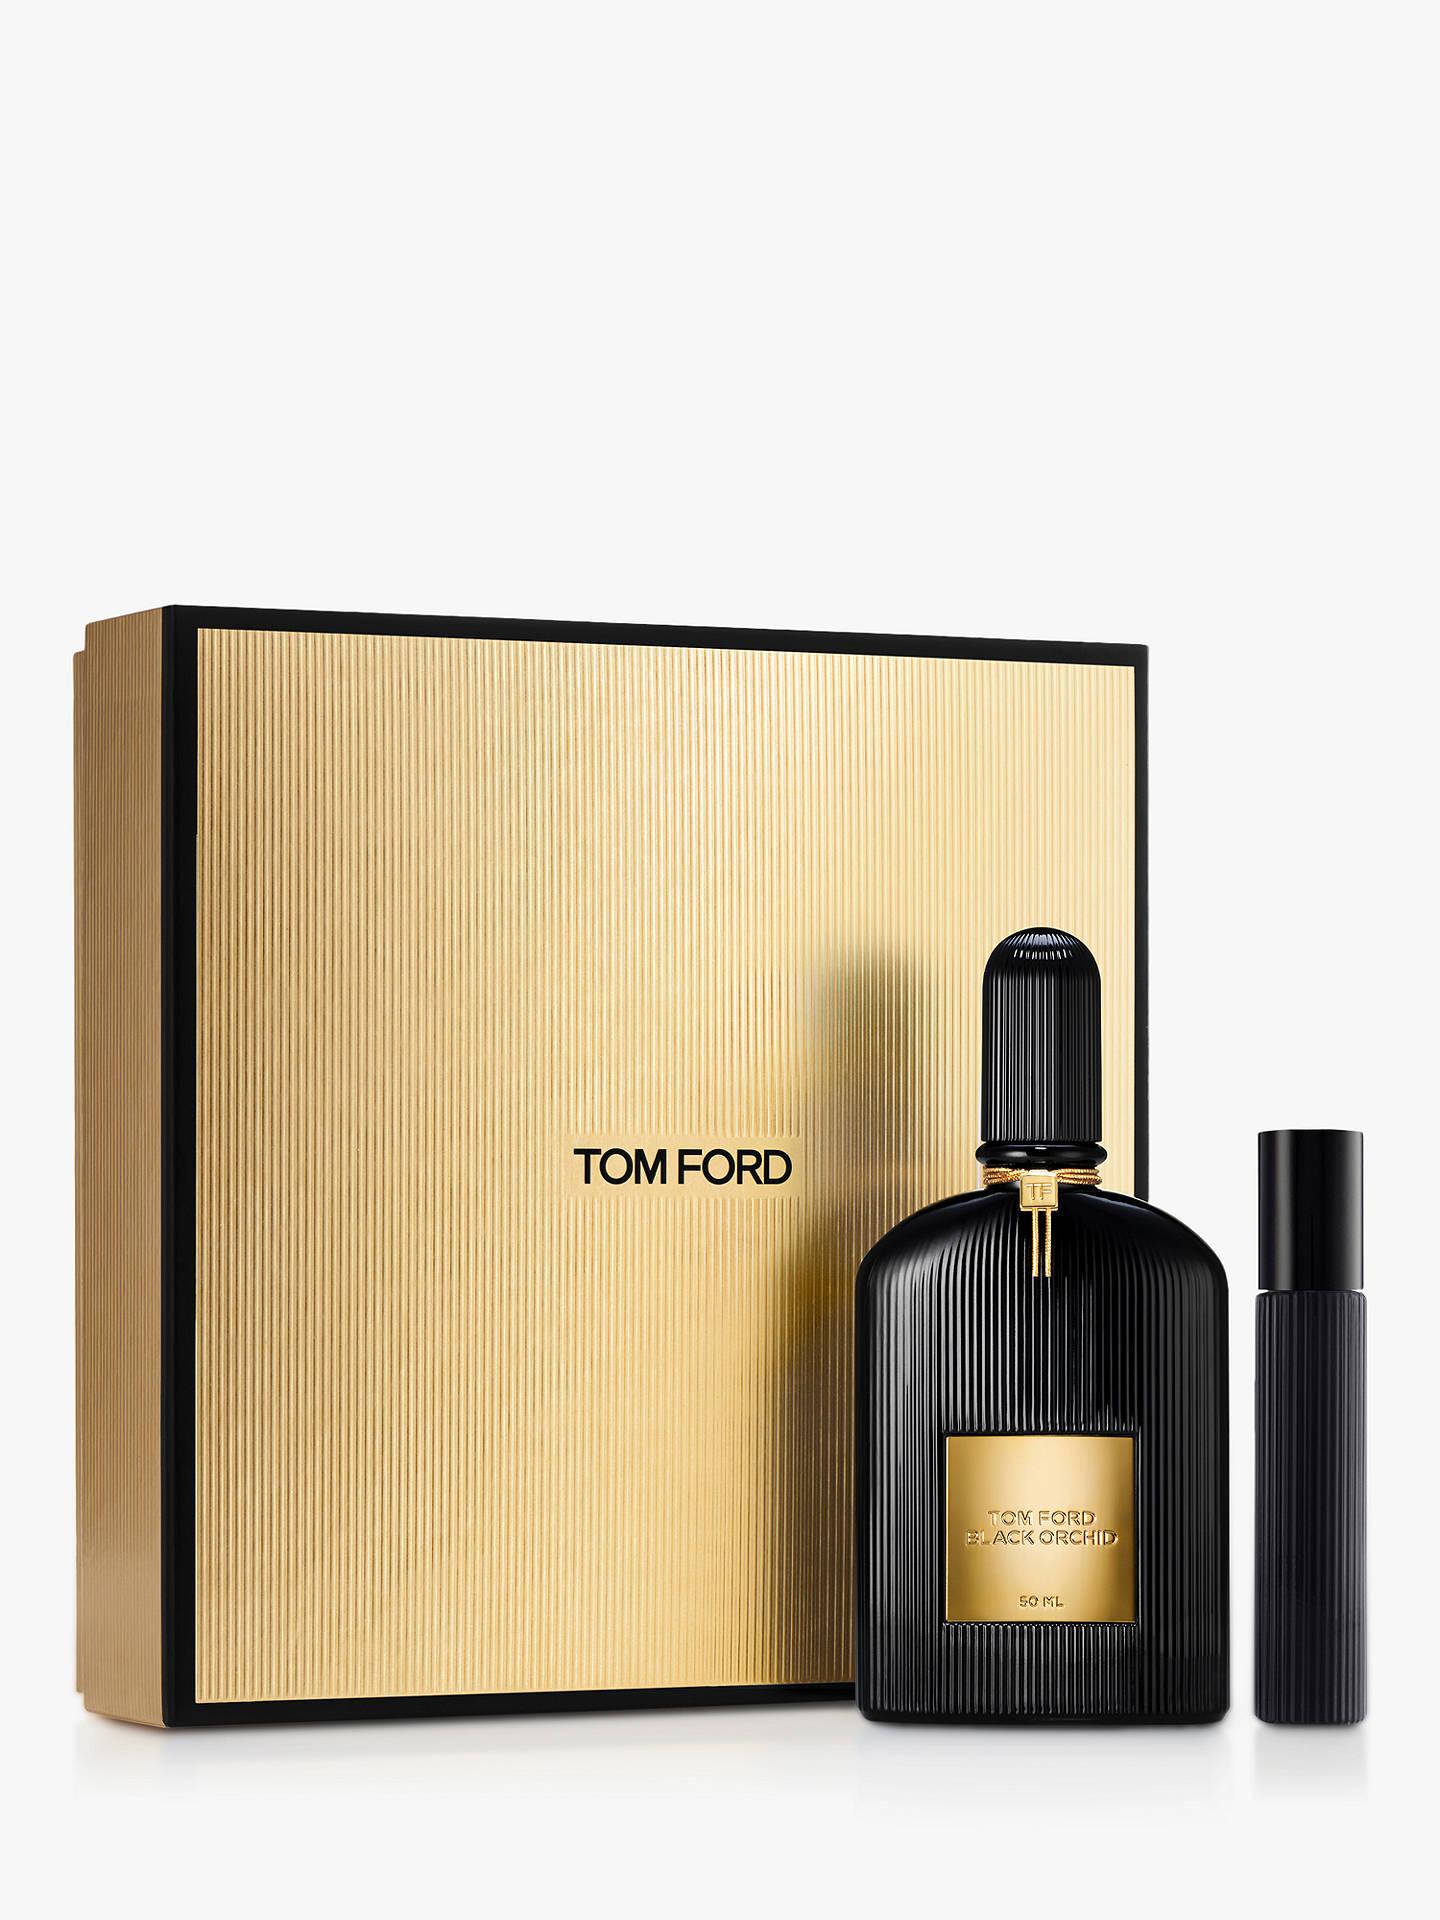 Tom Ford Black Orchid Eau De Parfum 50ml Fragrance Gift Set by Tom Ford